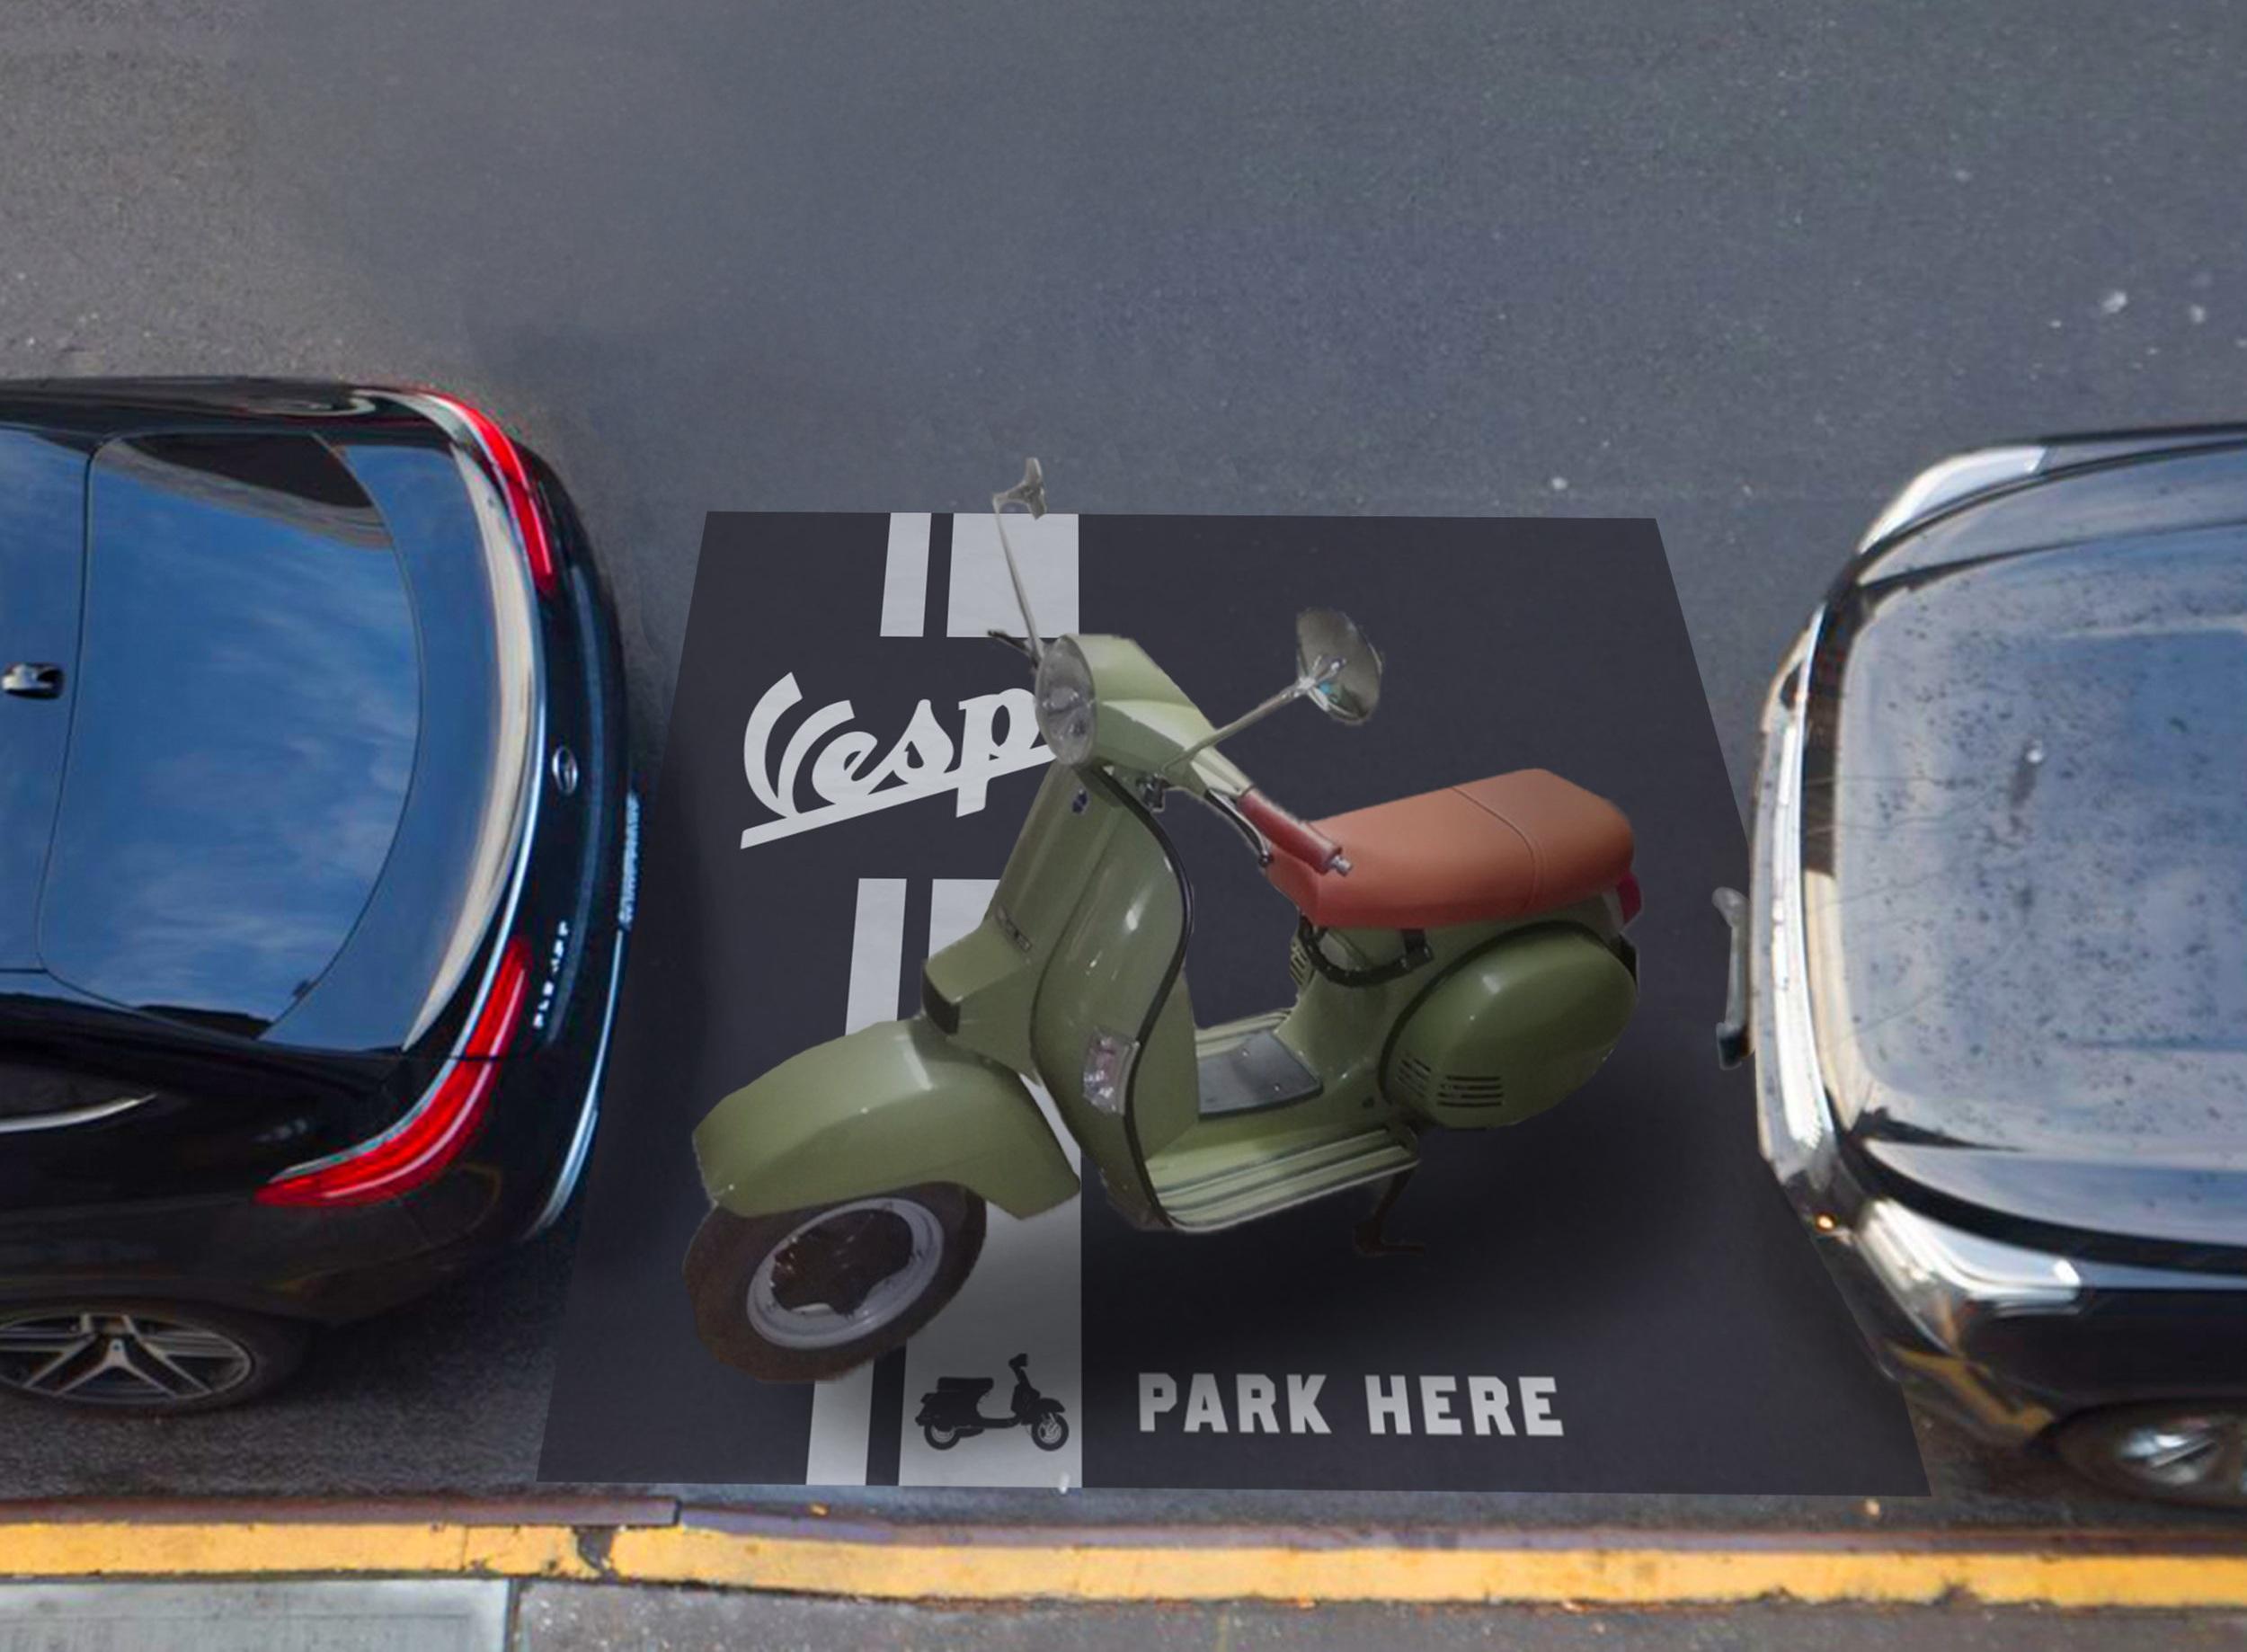 Vespa+Parking+Spot+1.jpg